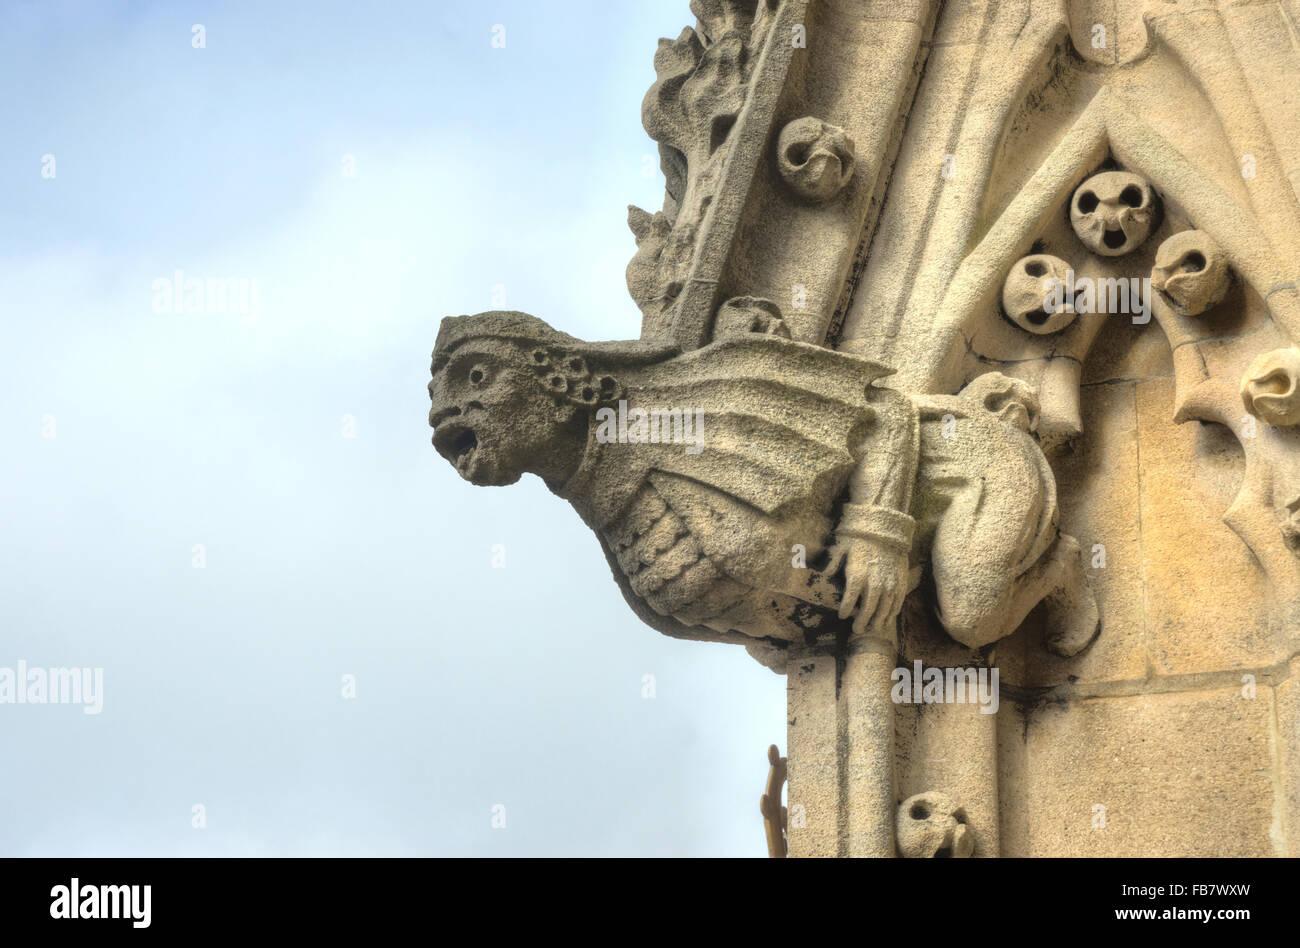 St Mary's Church Oxford Gargoyles  - Stock Image